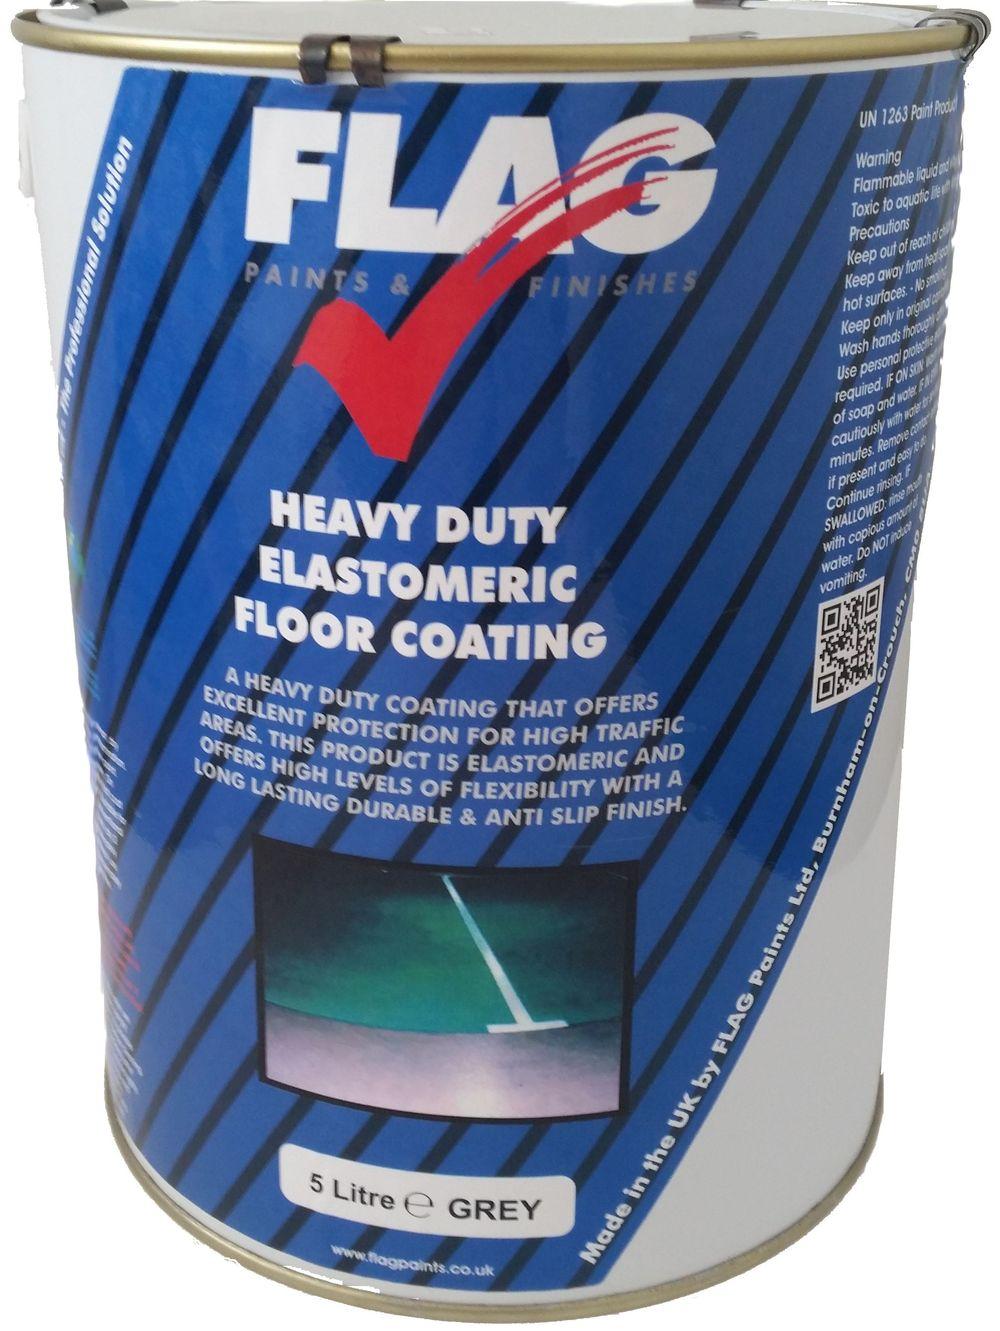 Flag Paints Heavy Duty Elastomeric Floor Coating.jpg